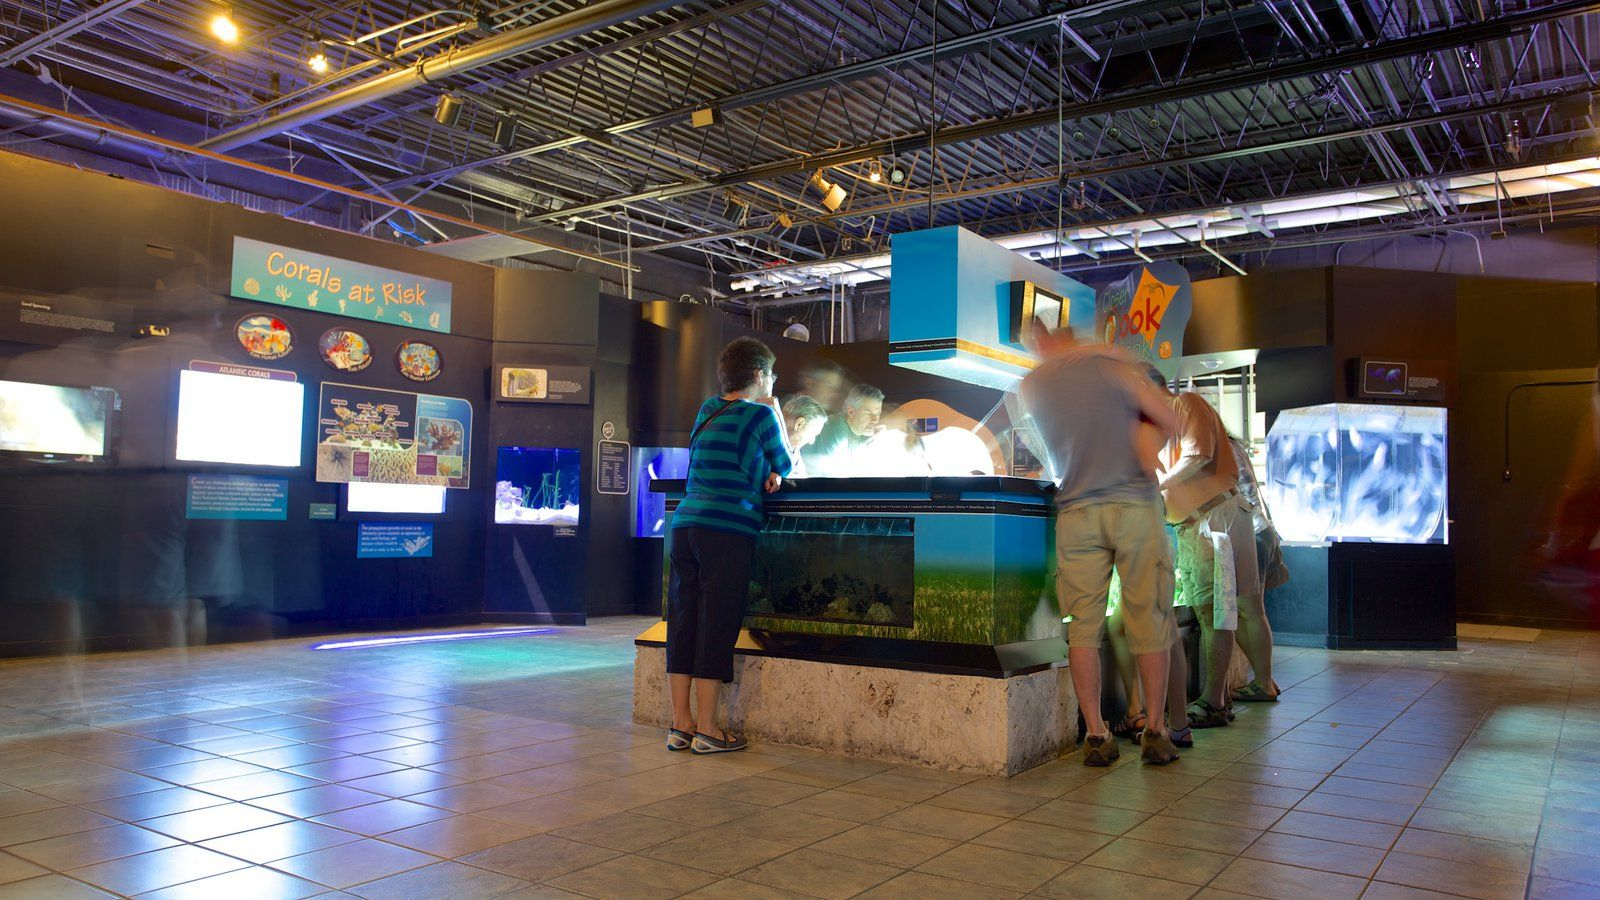 Mote Marine Aquarium Showing Interior Views And Marine Life